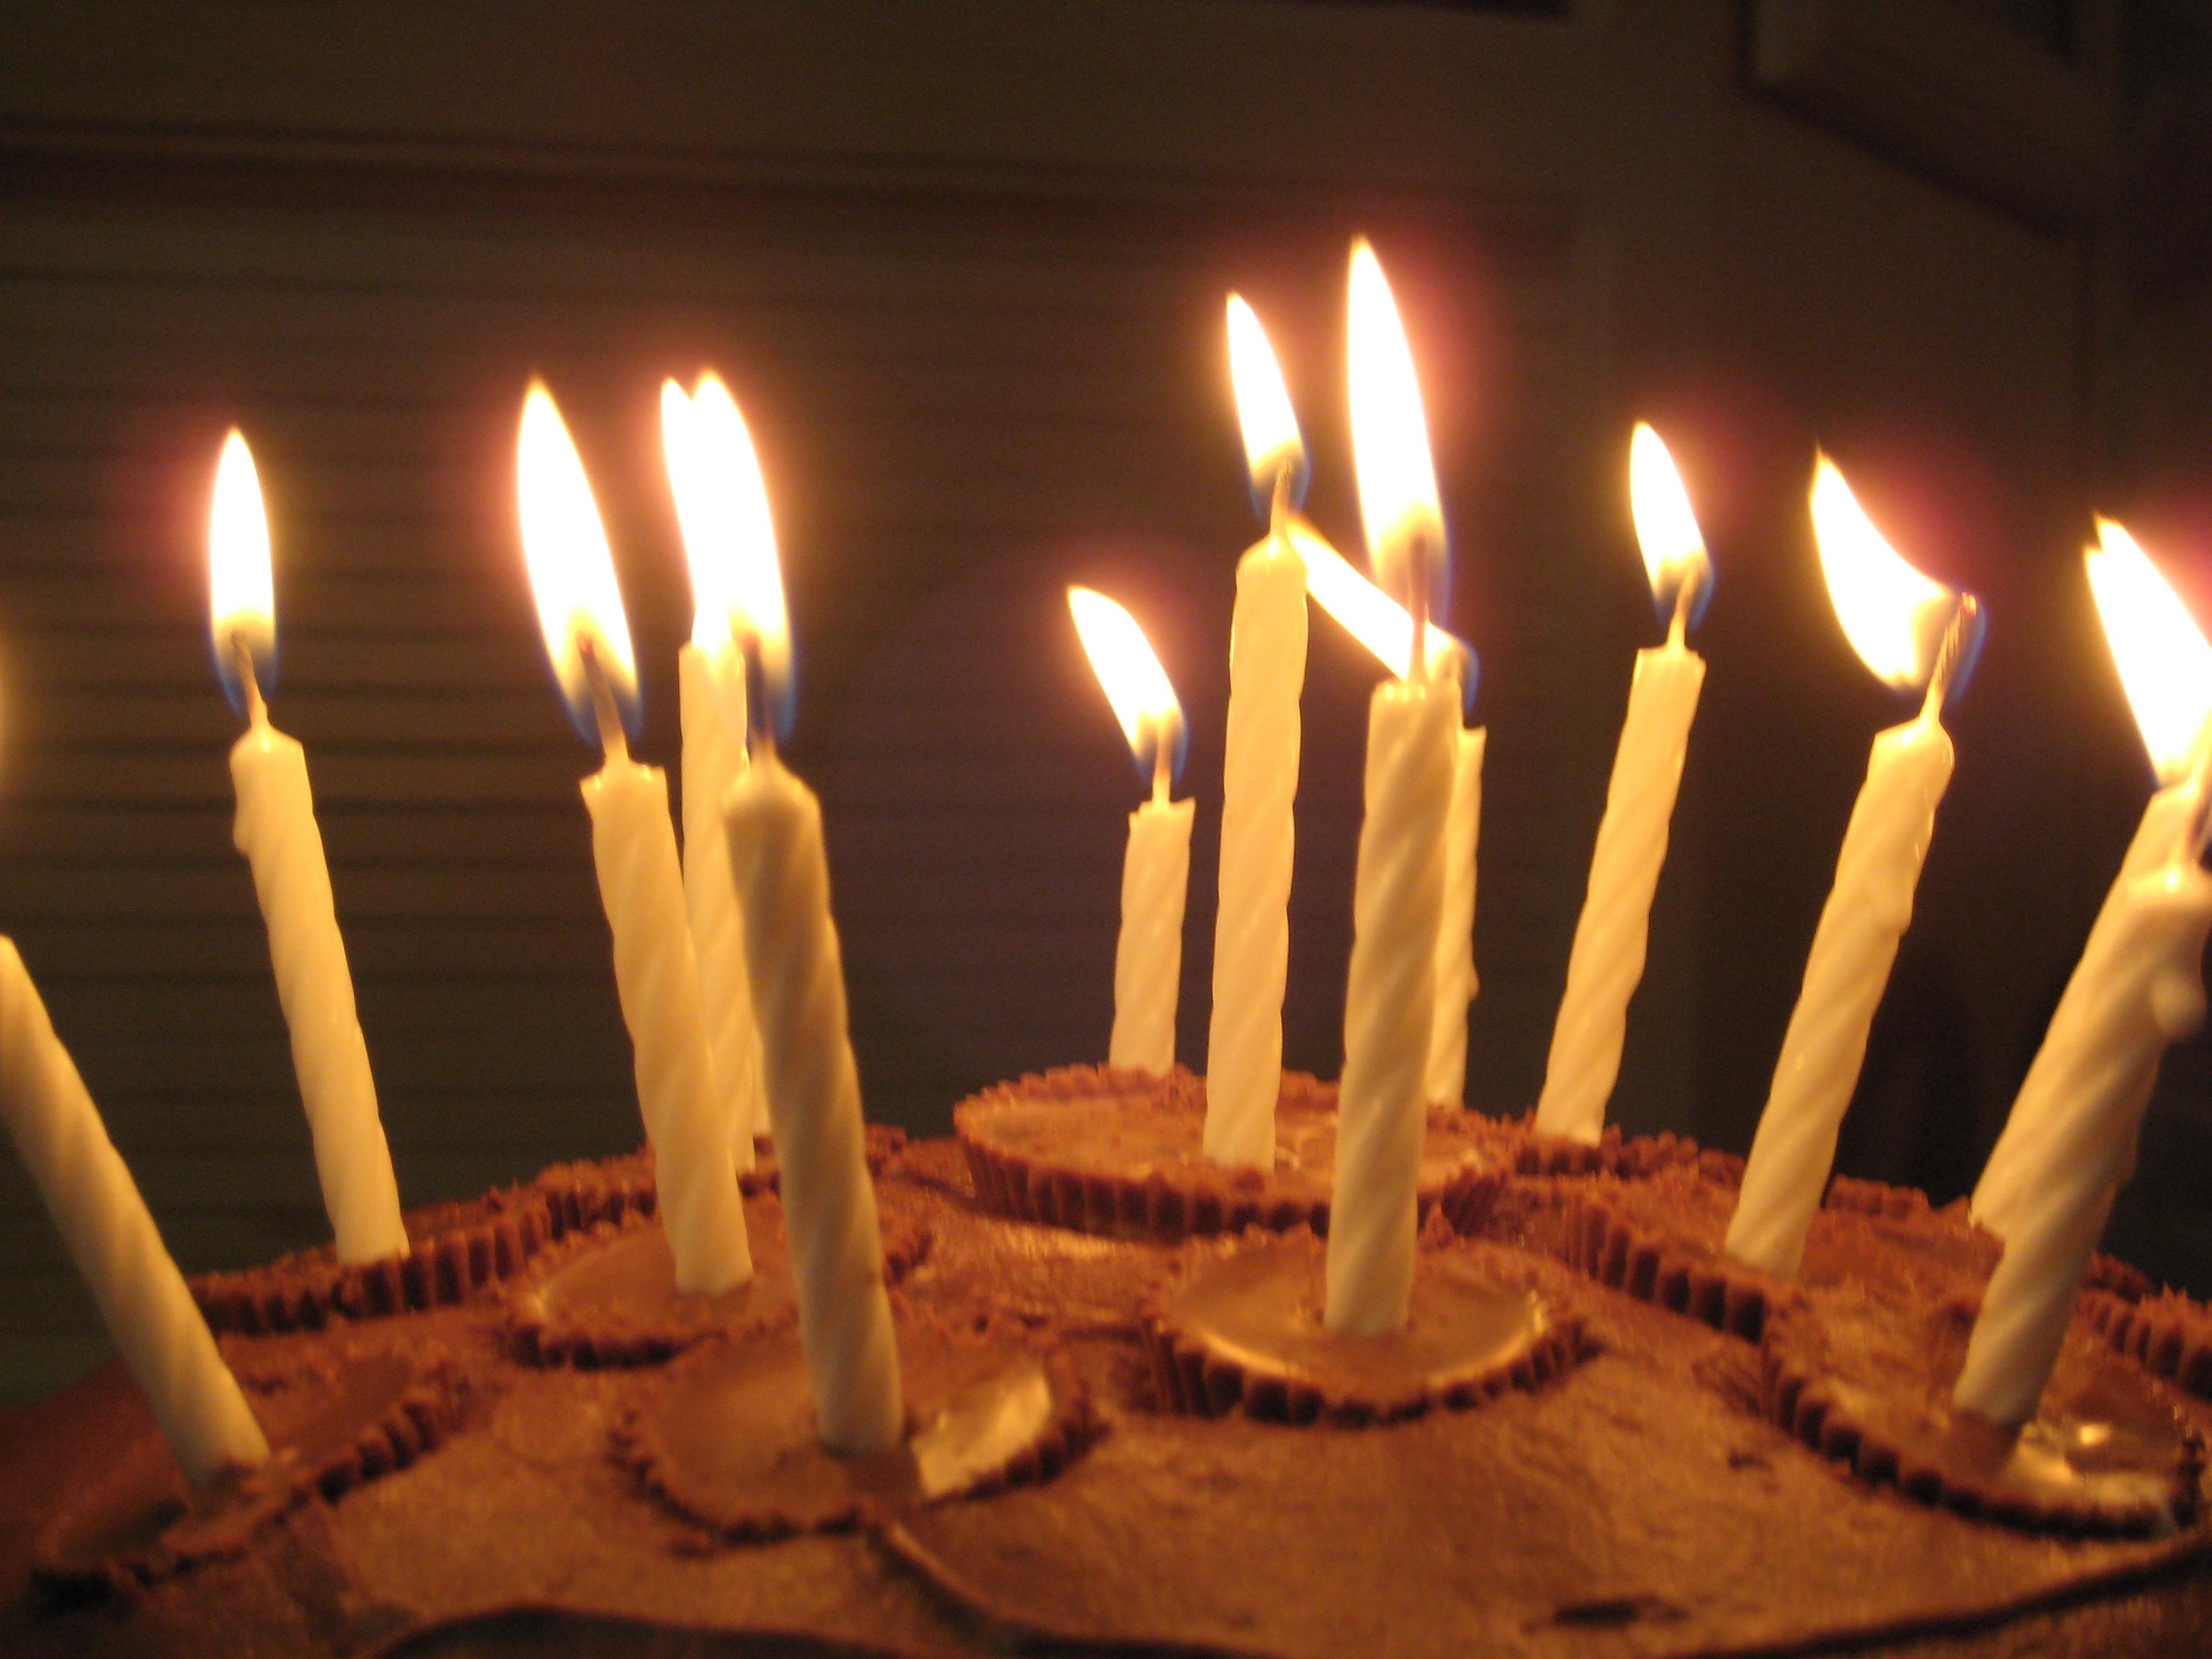 http://upload.wikimedia.org/wikipedia/en/9/99/CandleCake.JPG